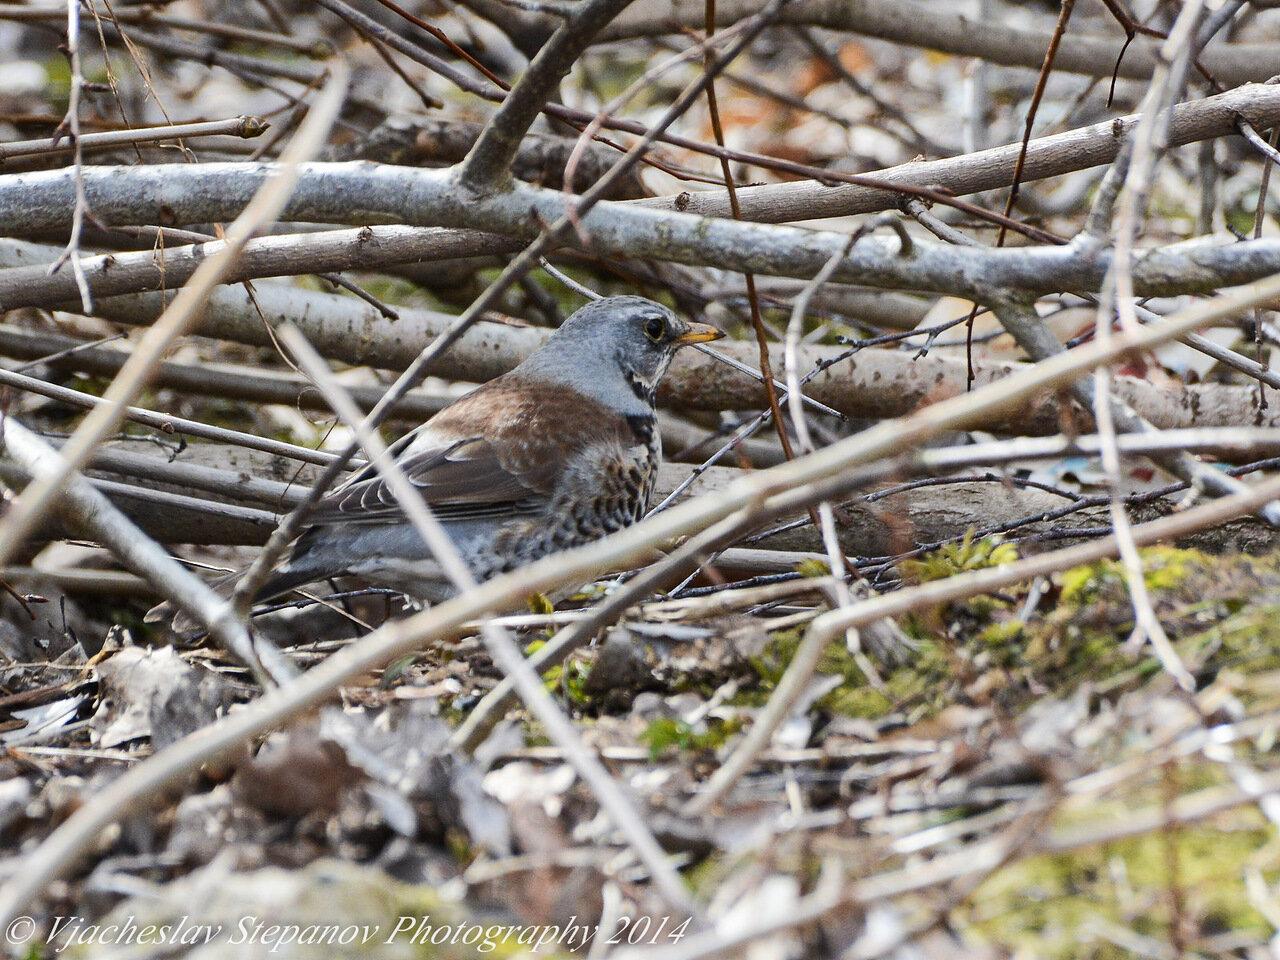 Дрозд-рябинник (Turdus pilaris). Автор фото:Вячеслав Степанов